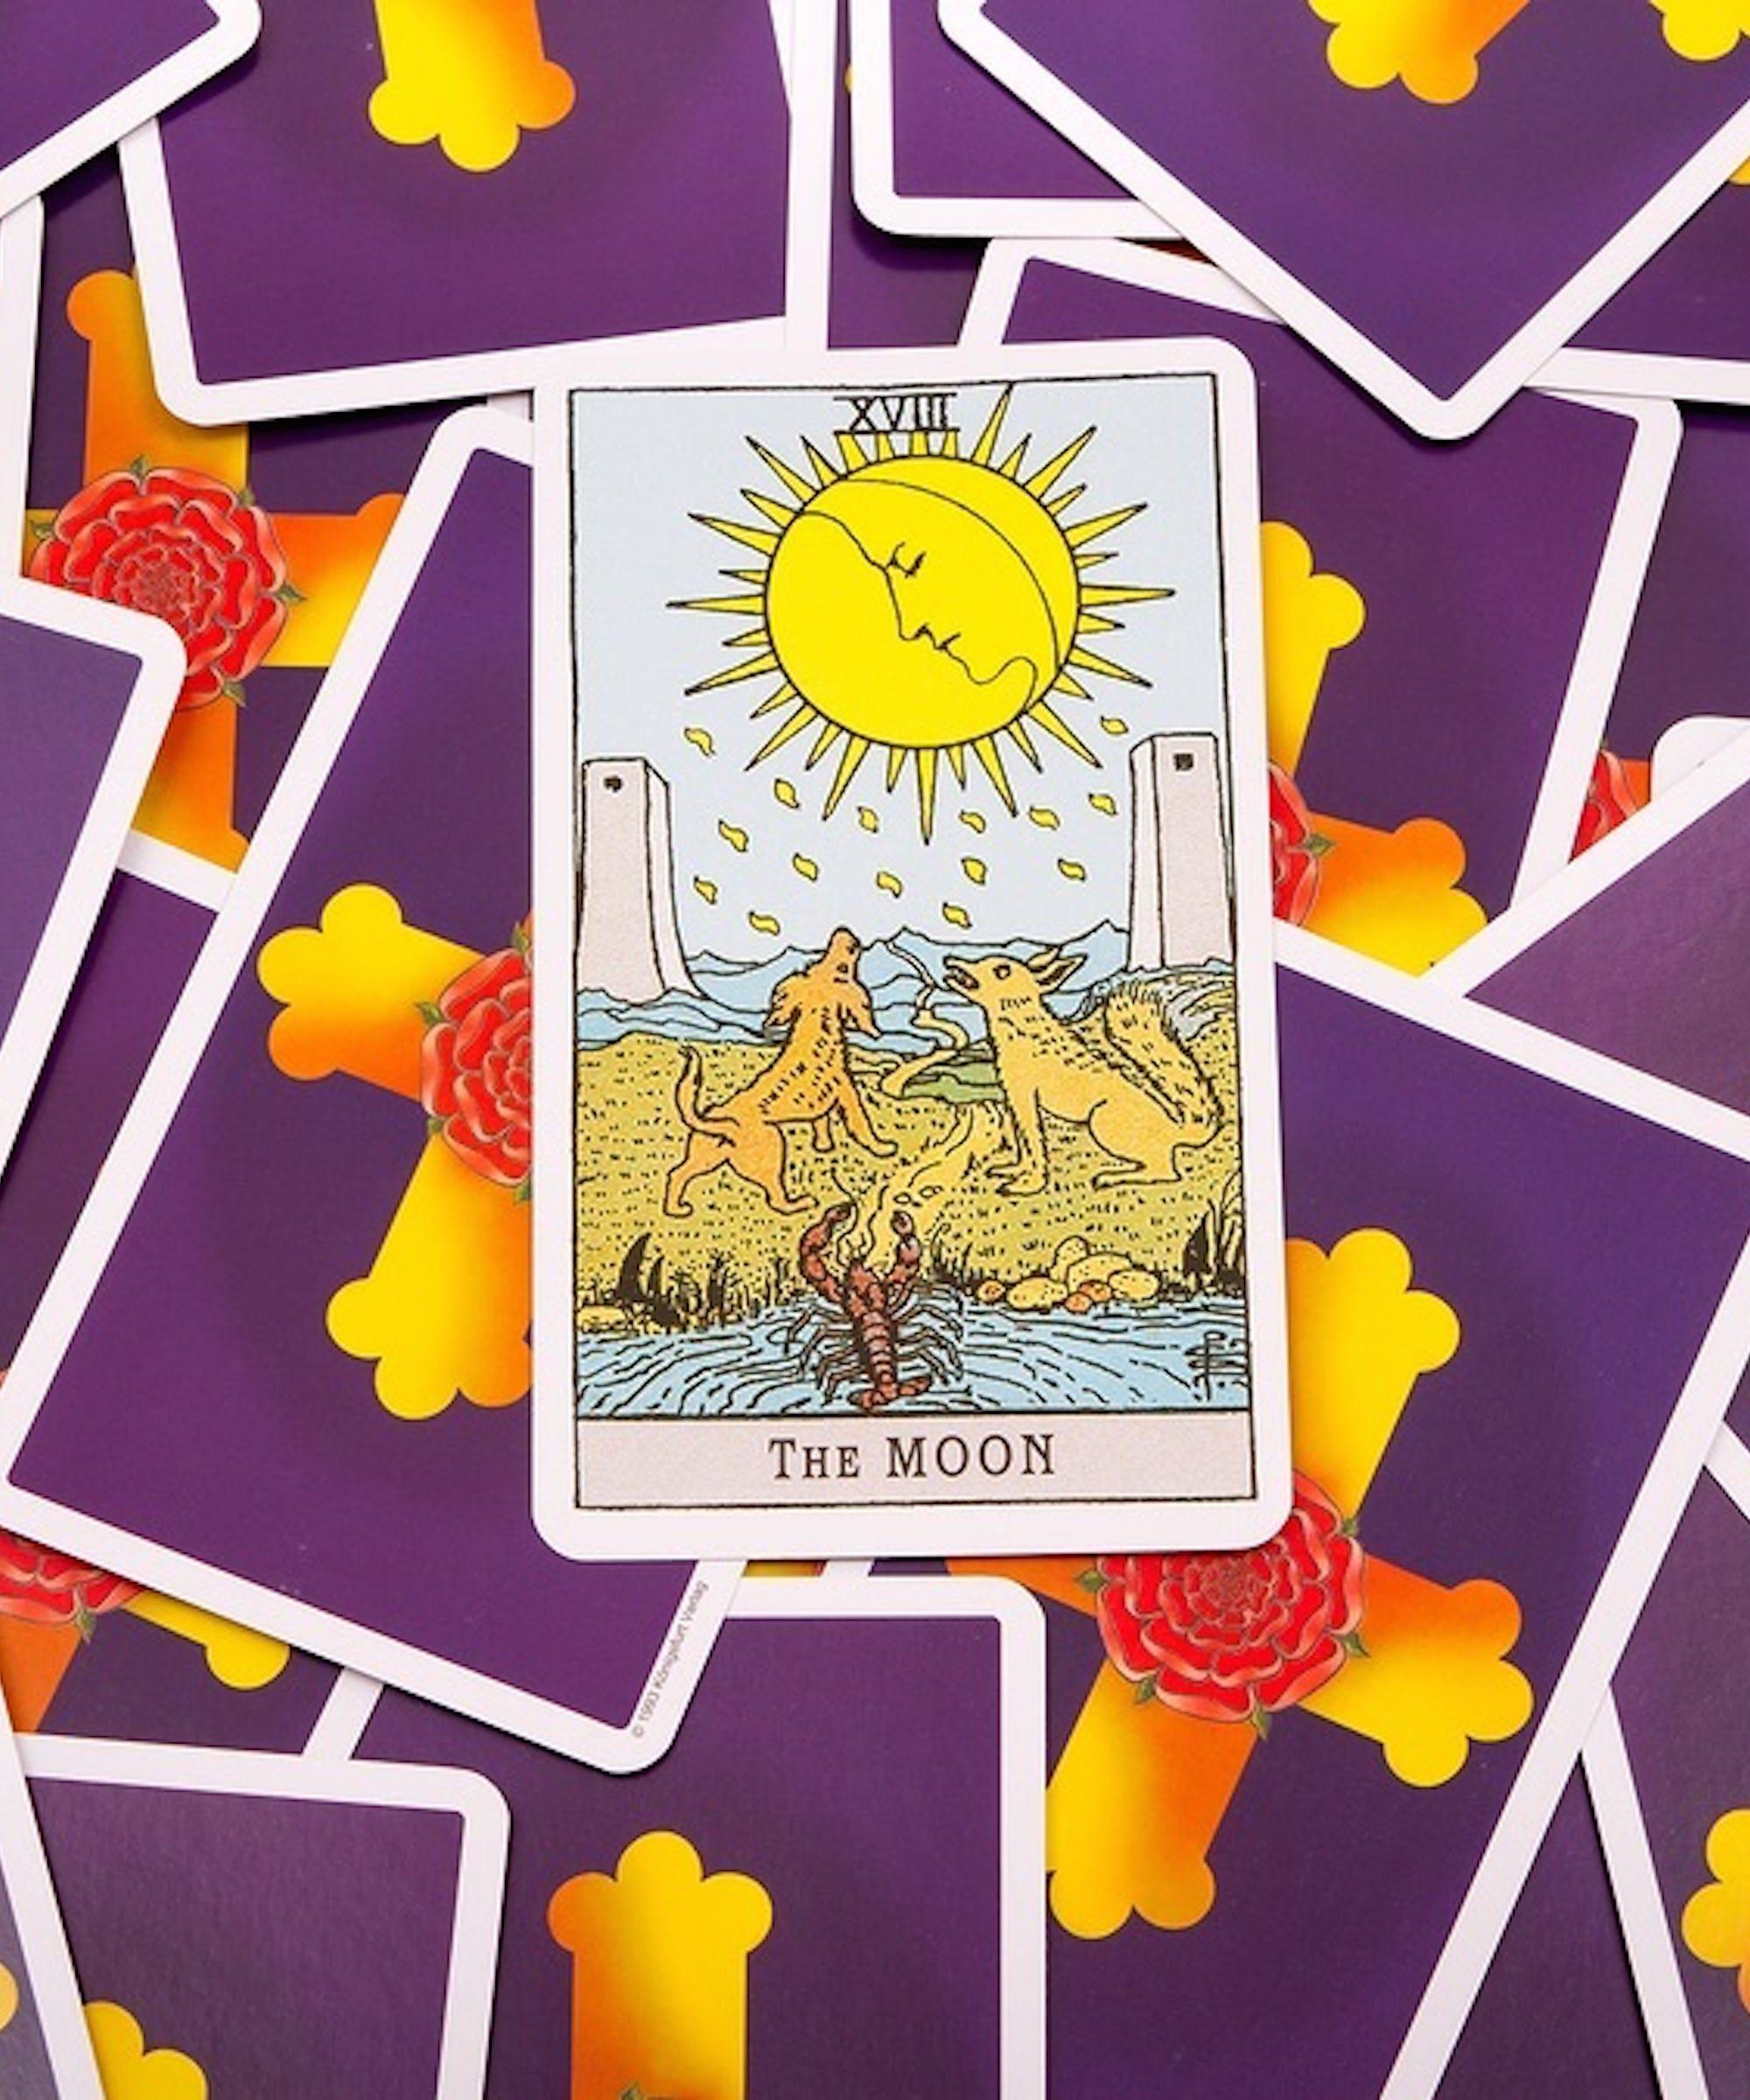 Tarot Card Reading Prediction For Trump Presidency